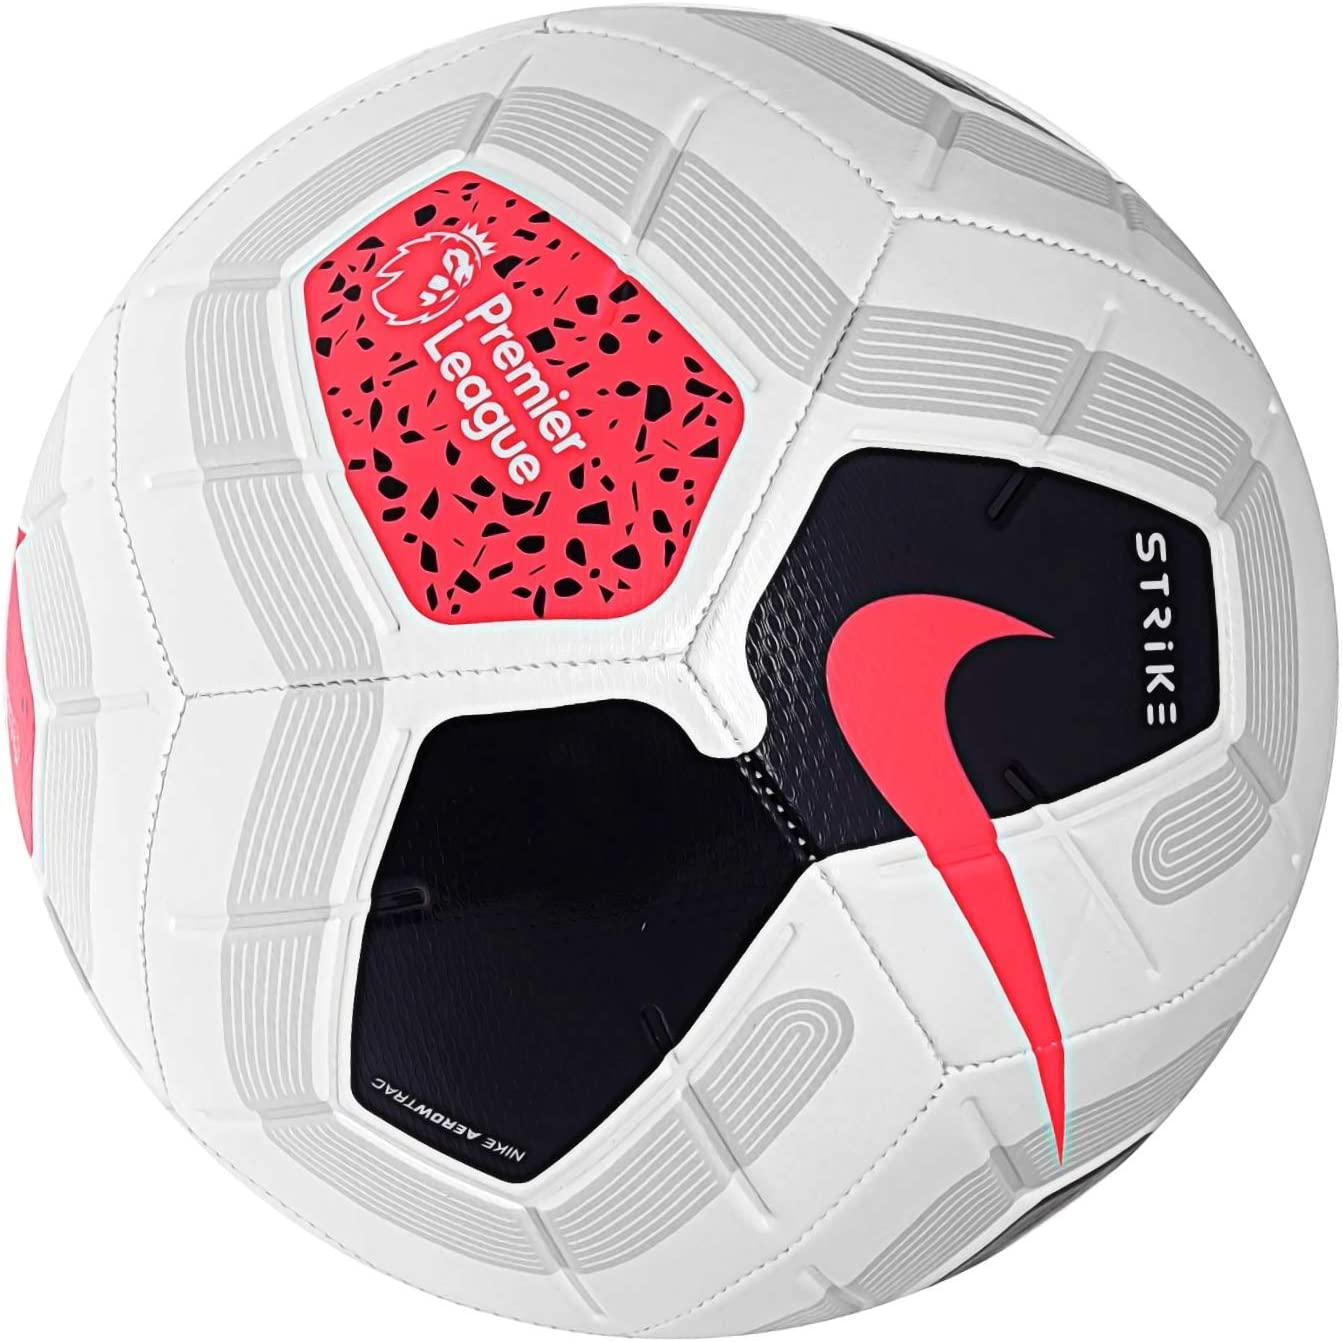 Nike Strike Pro Premier League Football 2019 2020 Size 5 Amazon Co Uk Sports Outdoors